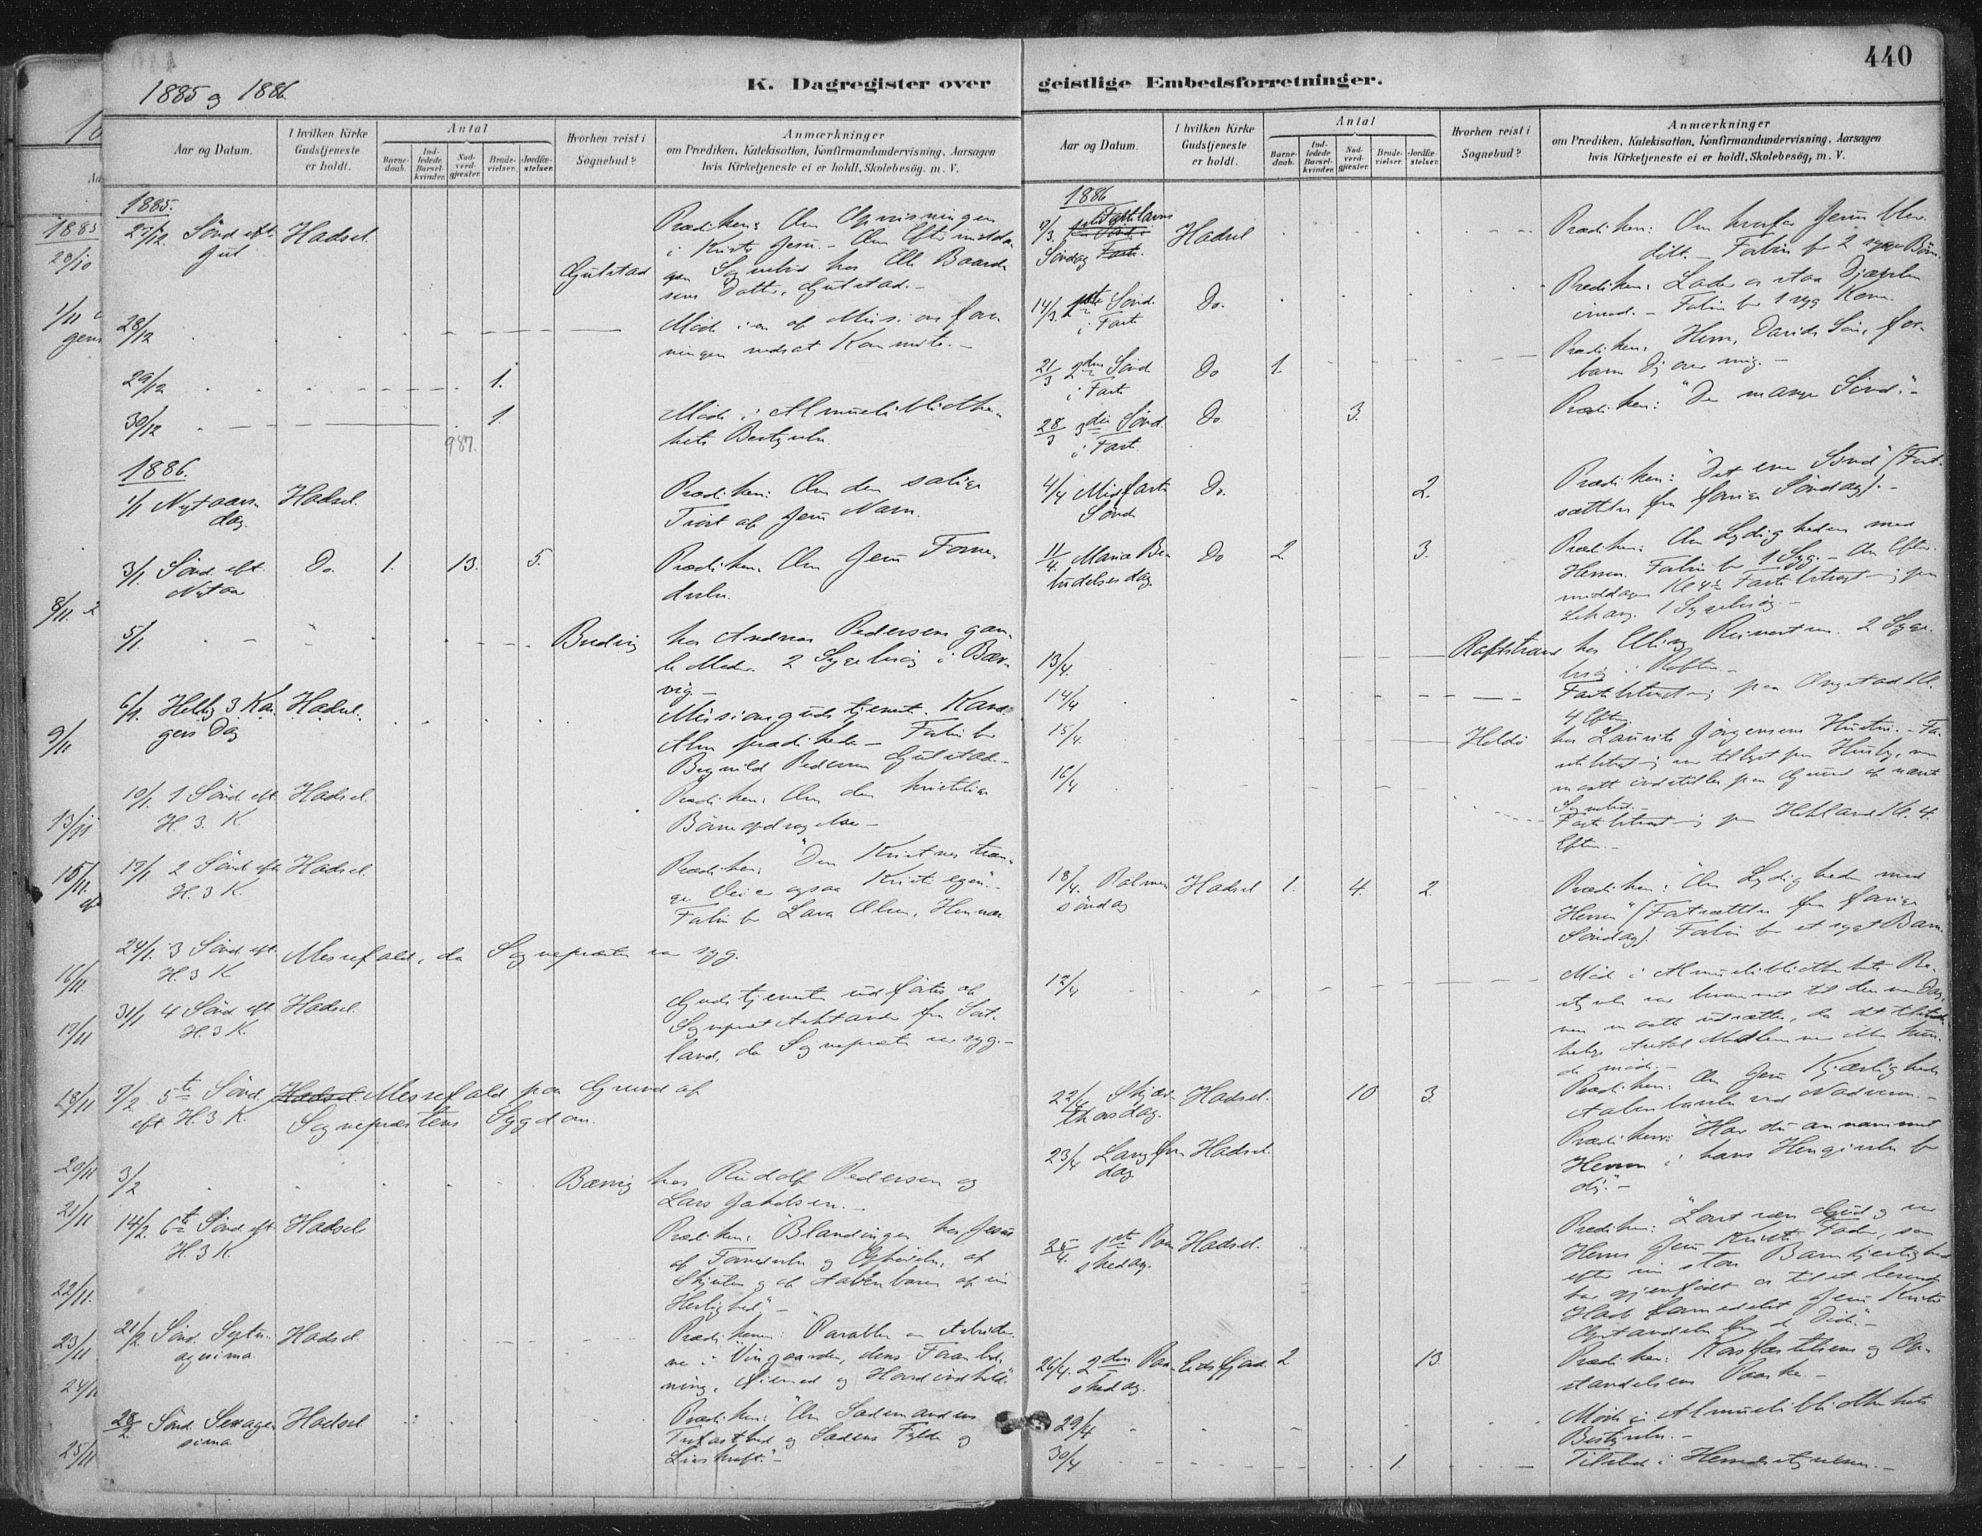 SAT, Ministerialprotokoller, klokkerbøker og fødselsregistre - Nordland, 888/L1244: Ministerialbok nr. 888A10, 1880-1890, s. 440